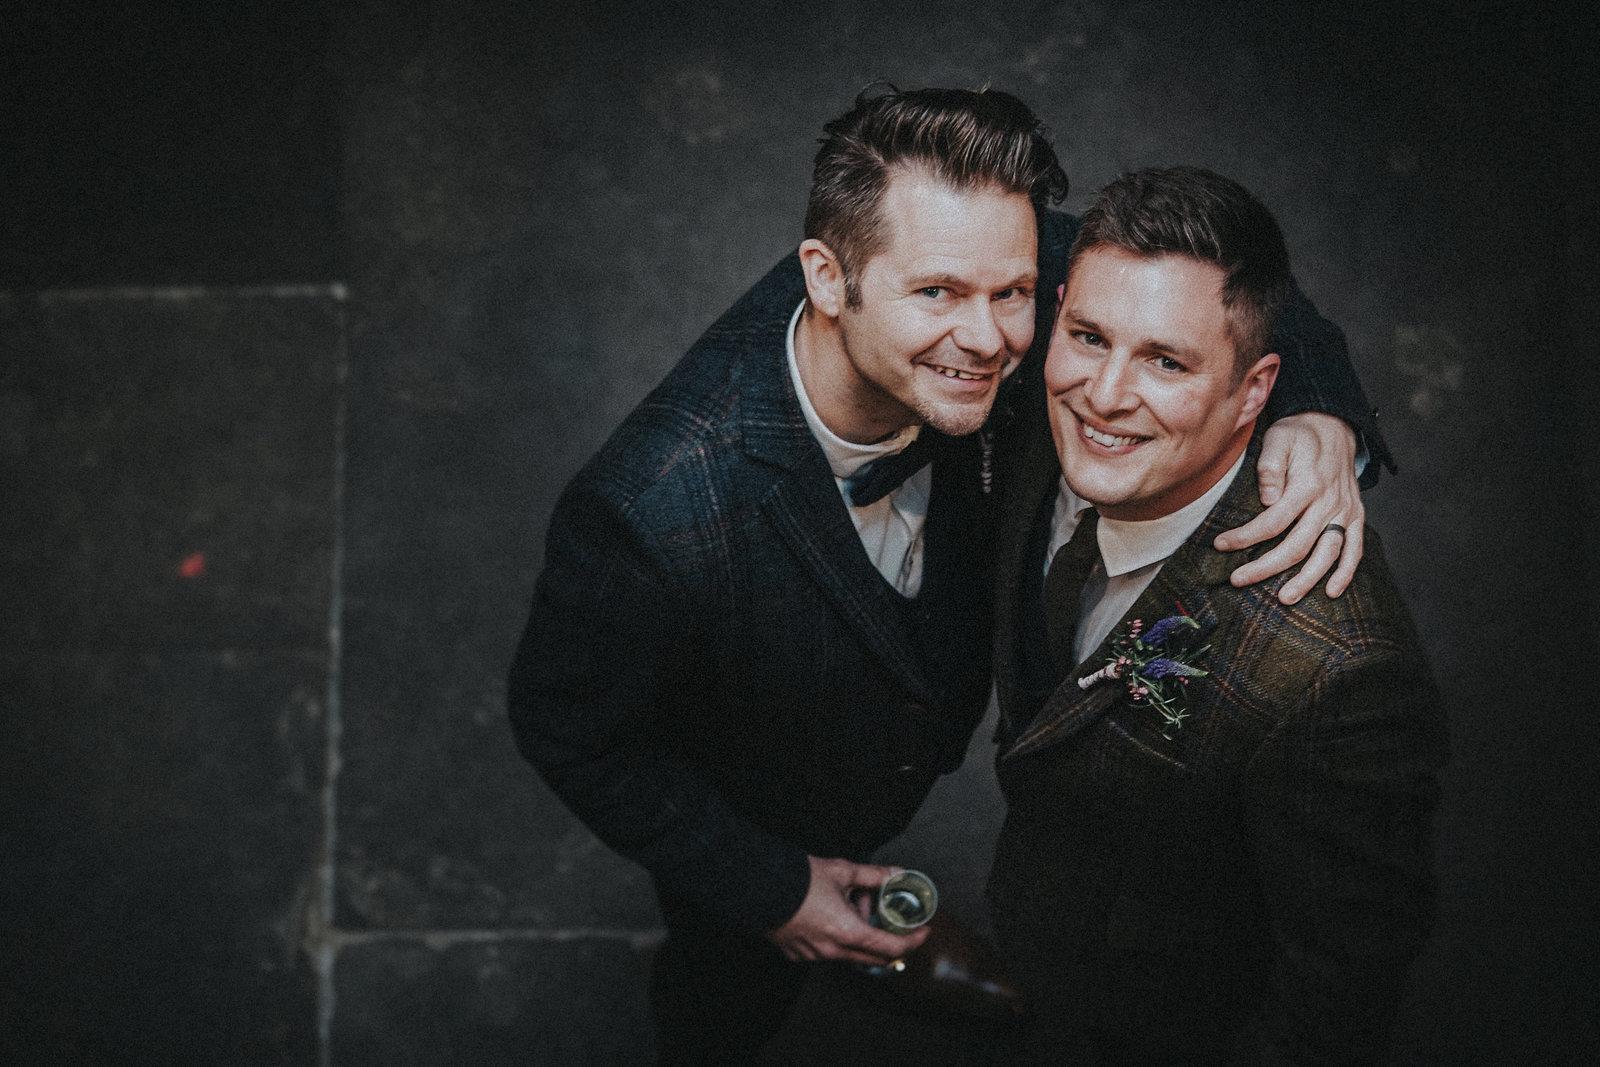 Grooms looking up smiling - LGBT Wedding Photographer - Jono Symonds